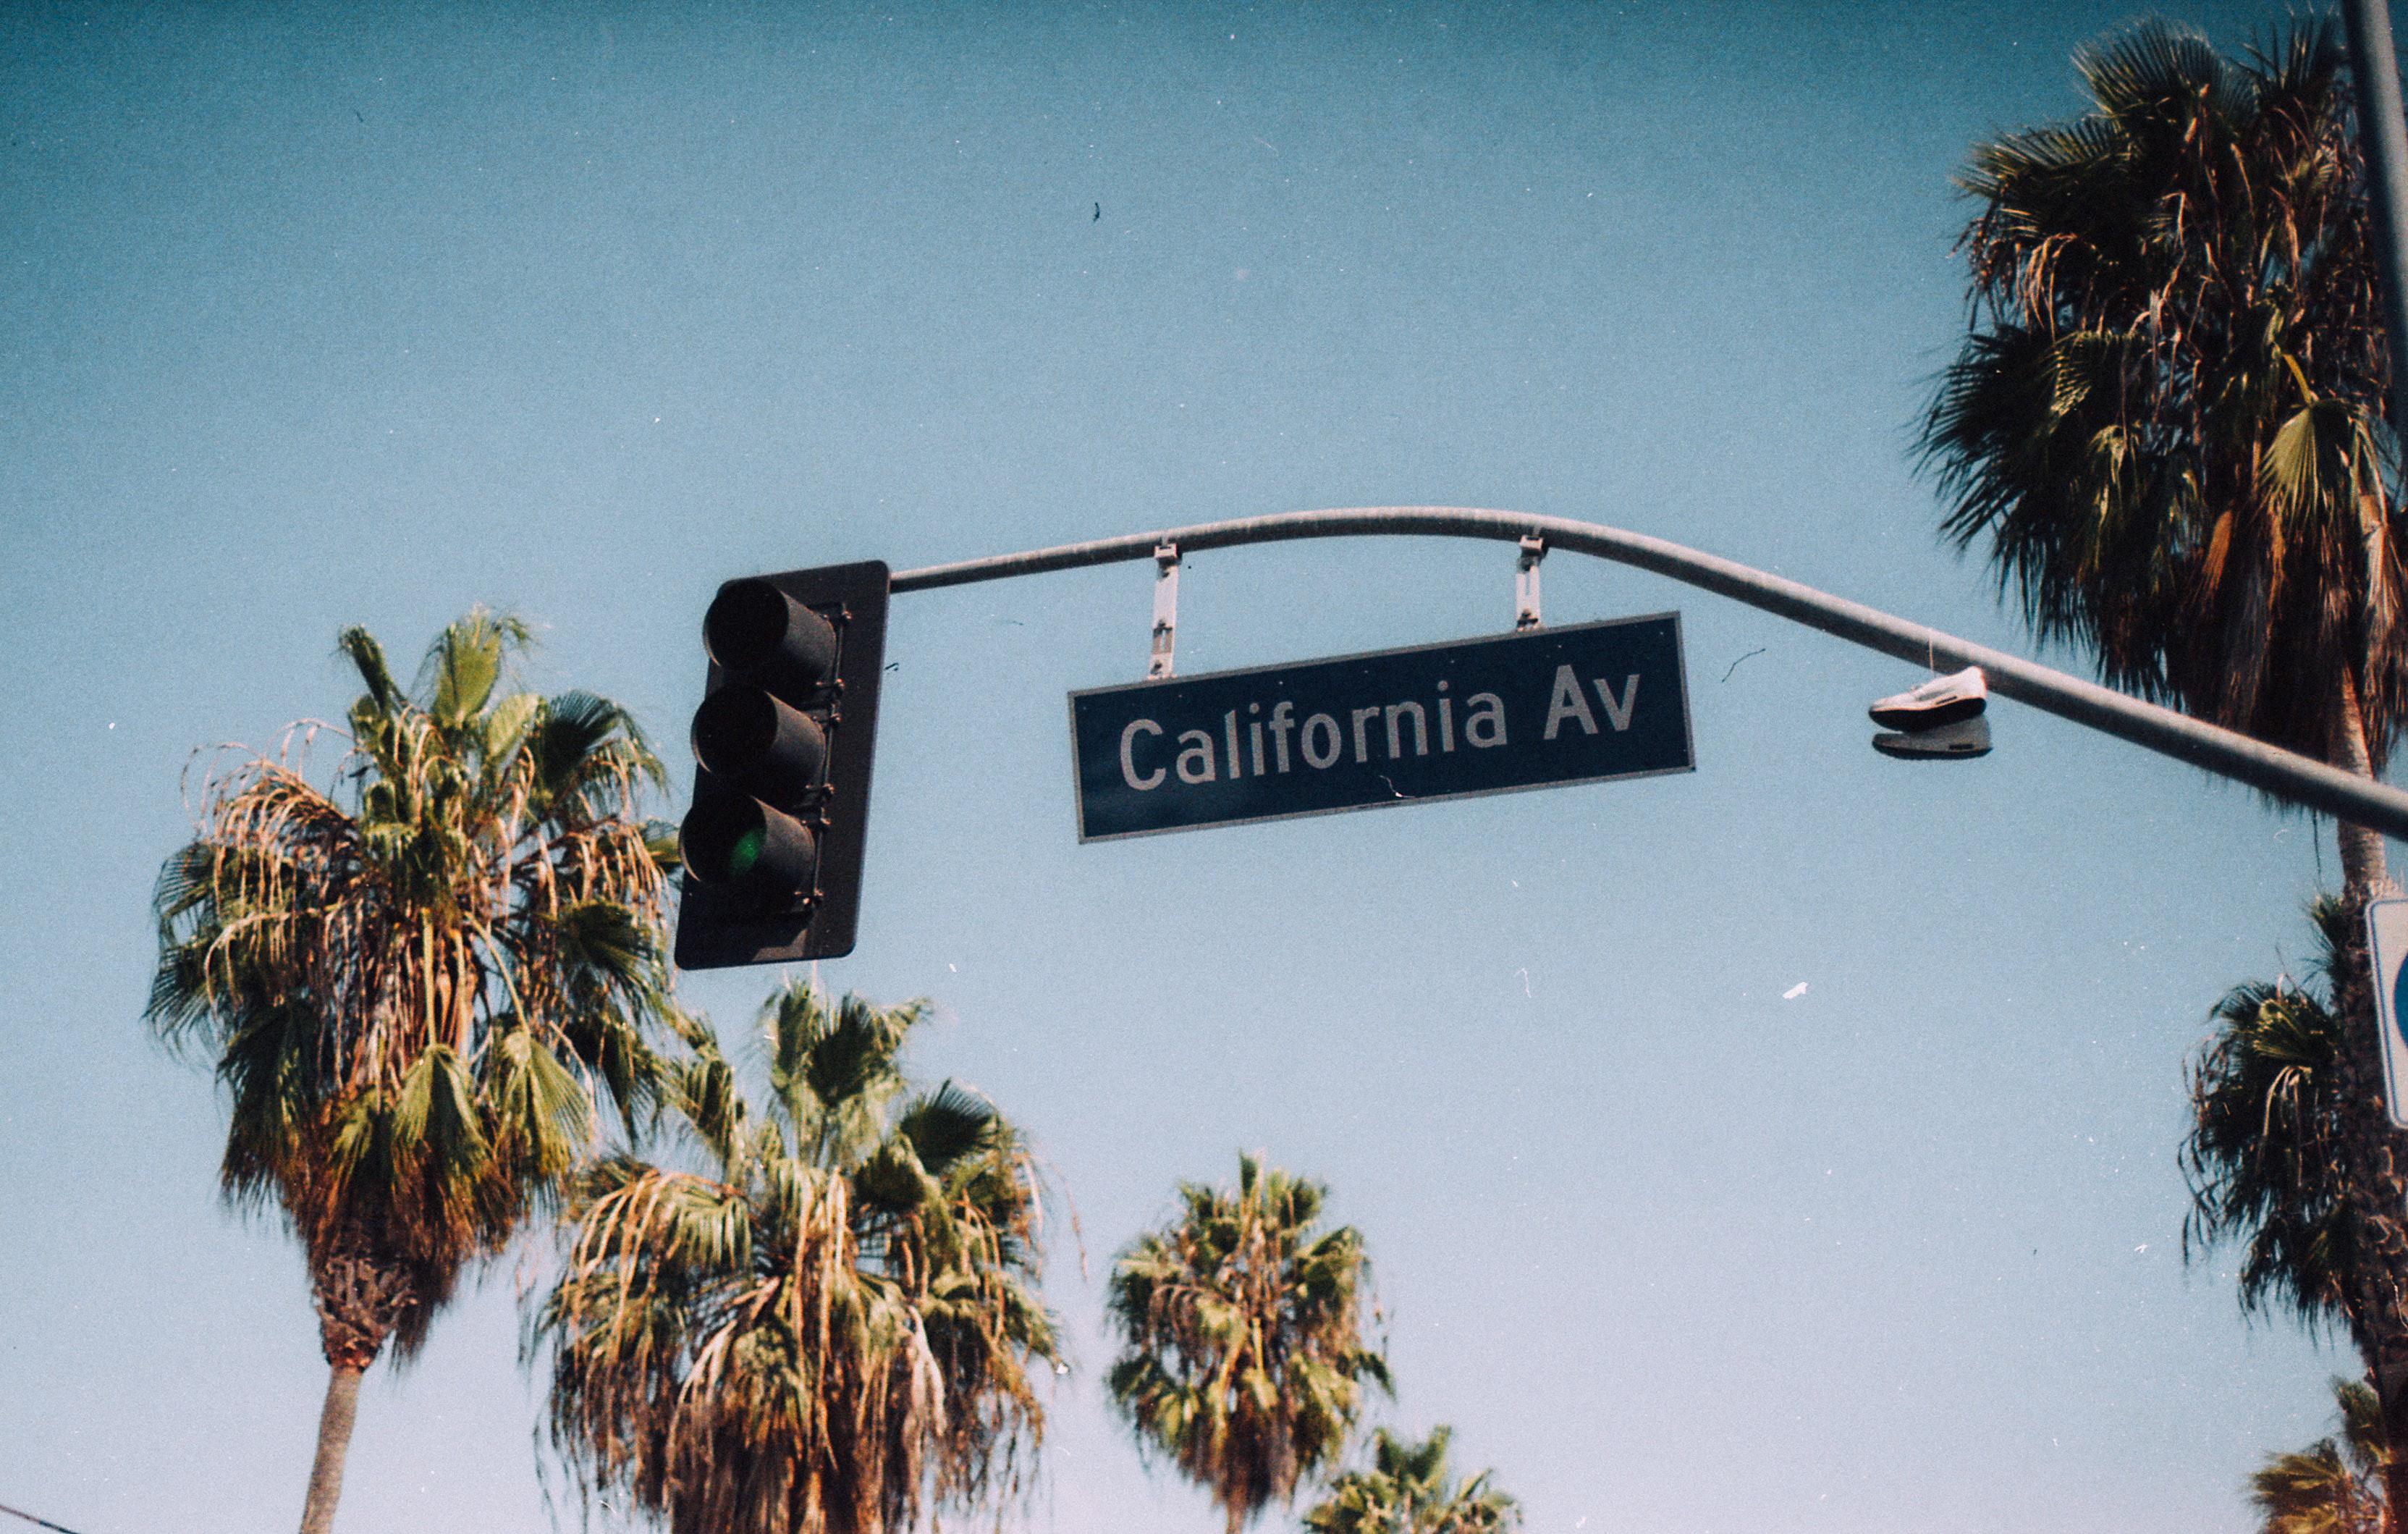 California avenue photo, welcome sign, Klook, California, Palm Trees